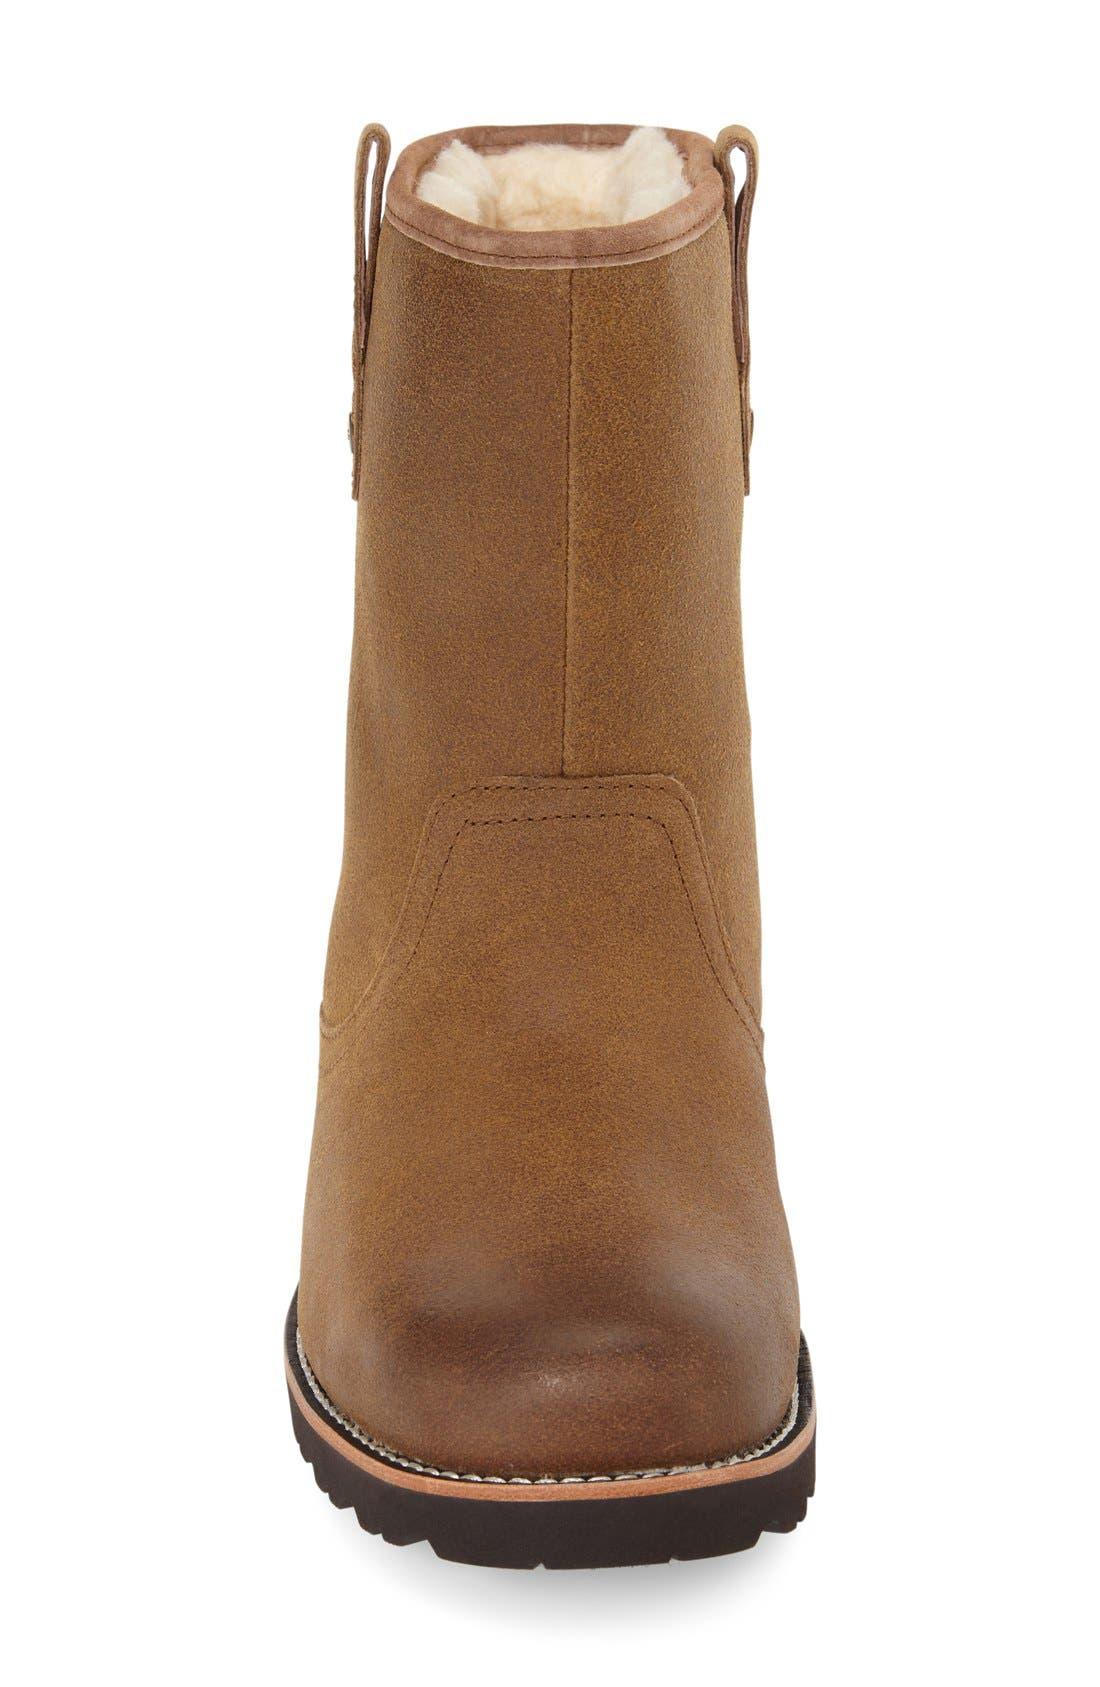 Stoneman Waterproof Boot,                             Alternate thumbnail 3, color,                             219